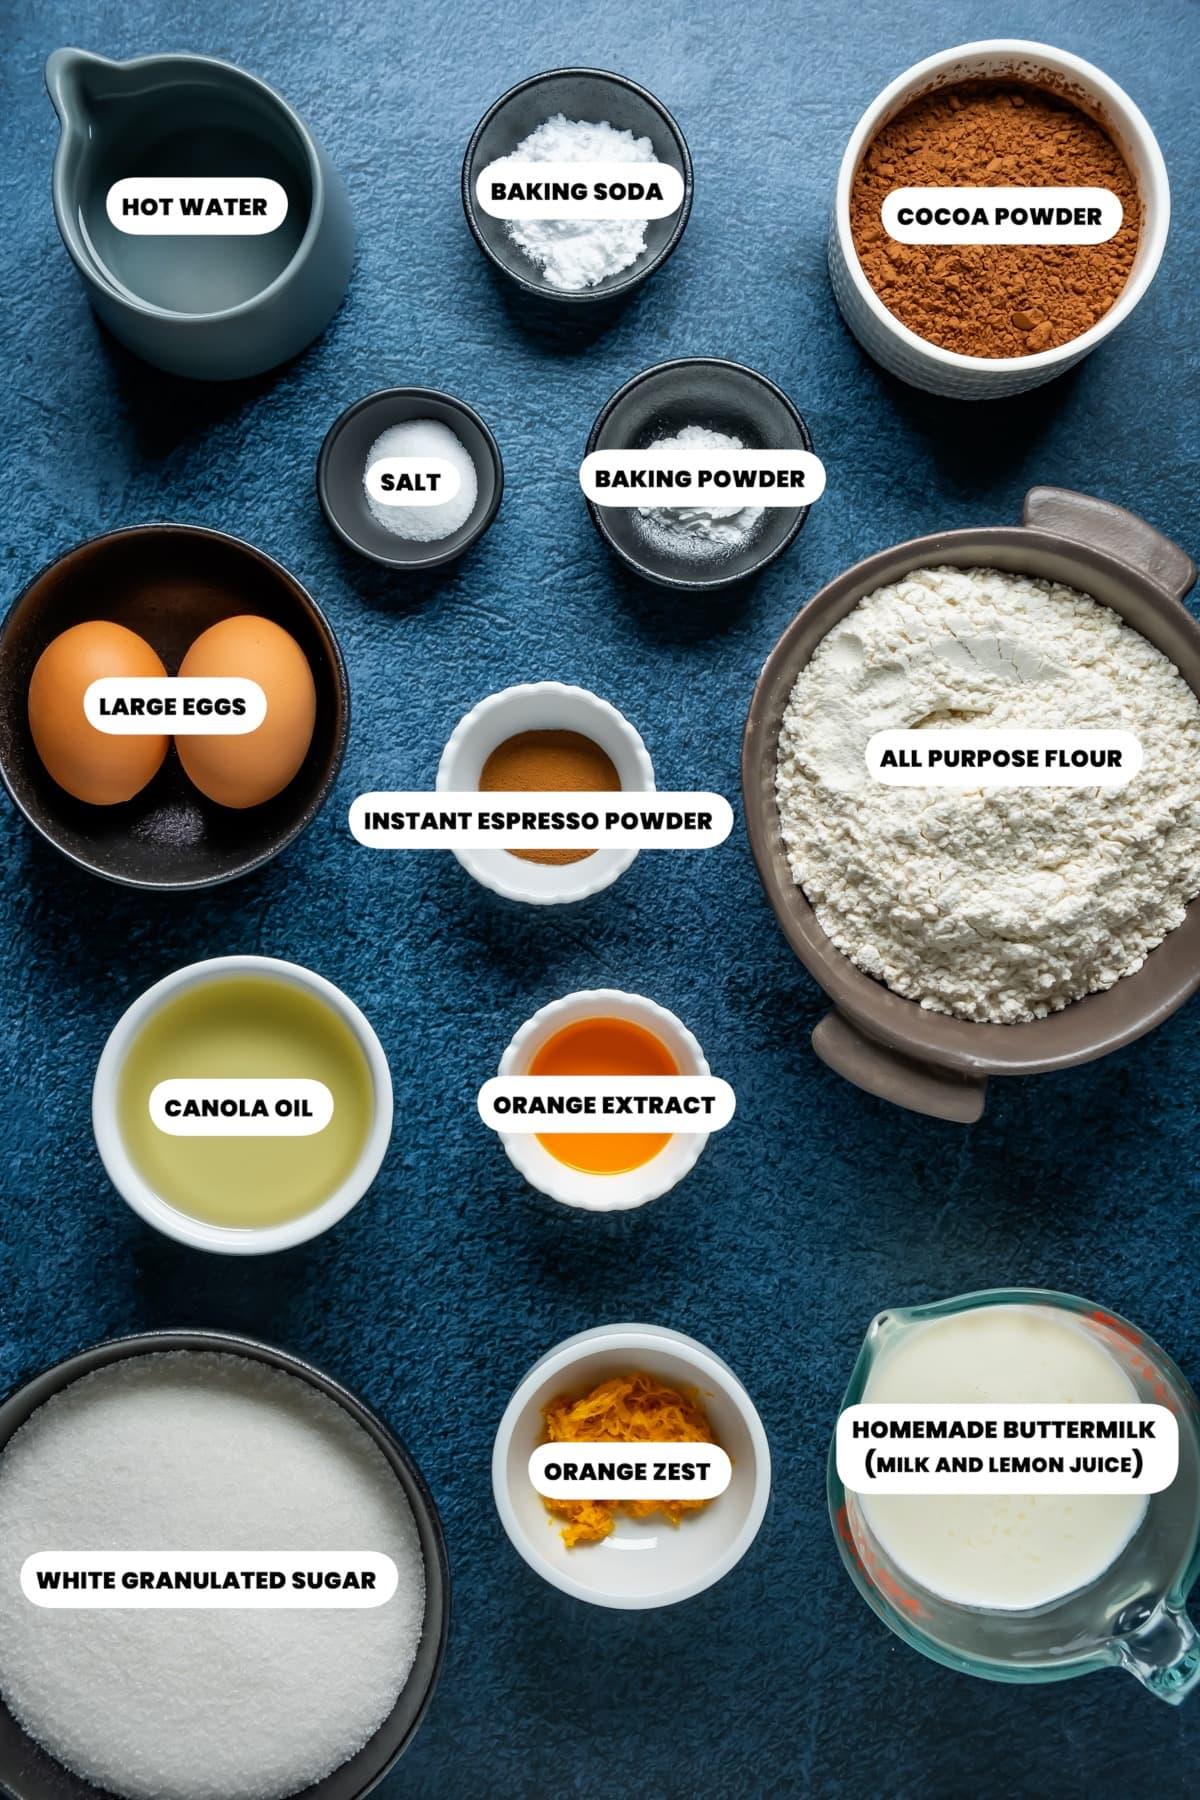 Photo of the ingredients needed to make chocolate orange cake.